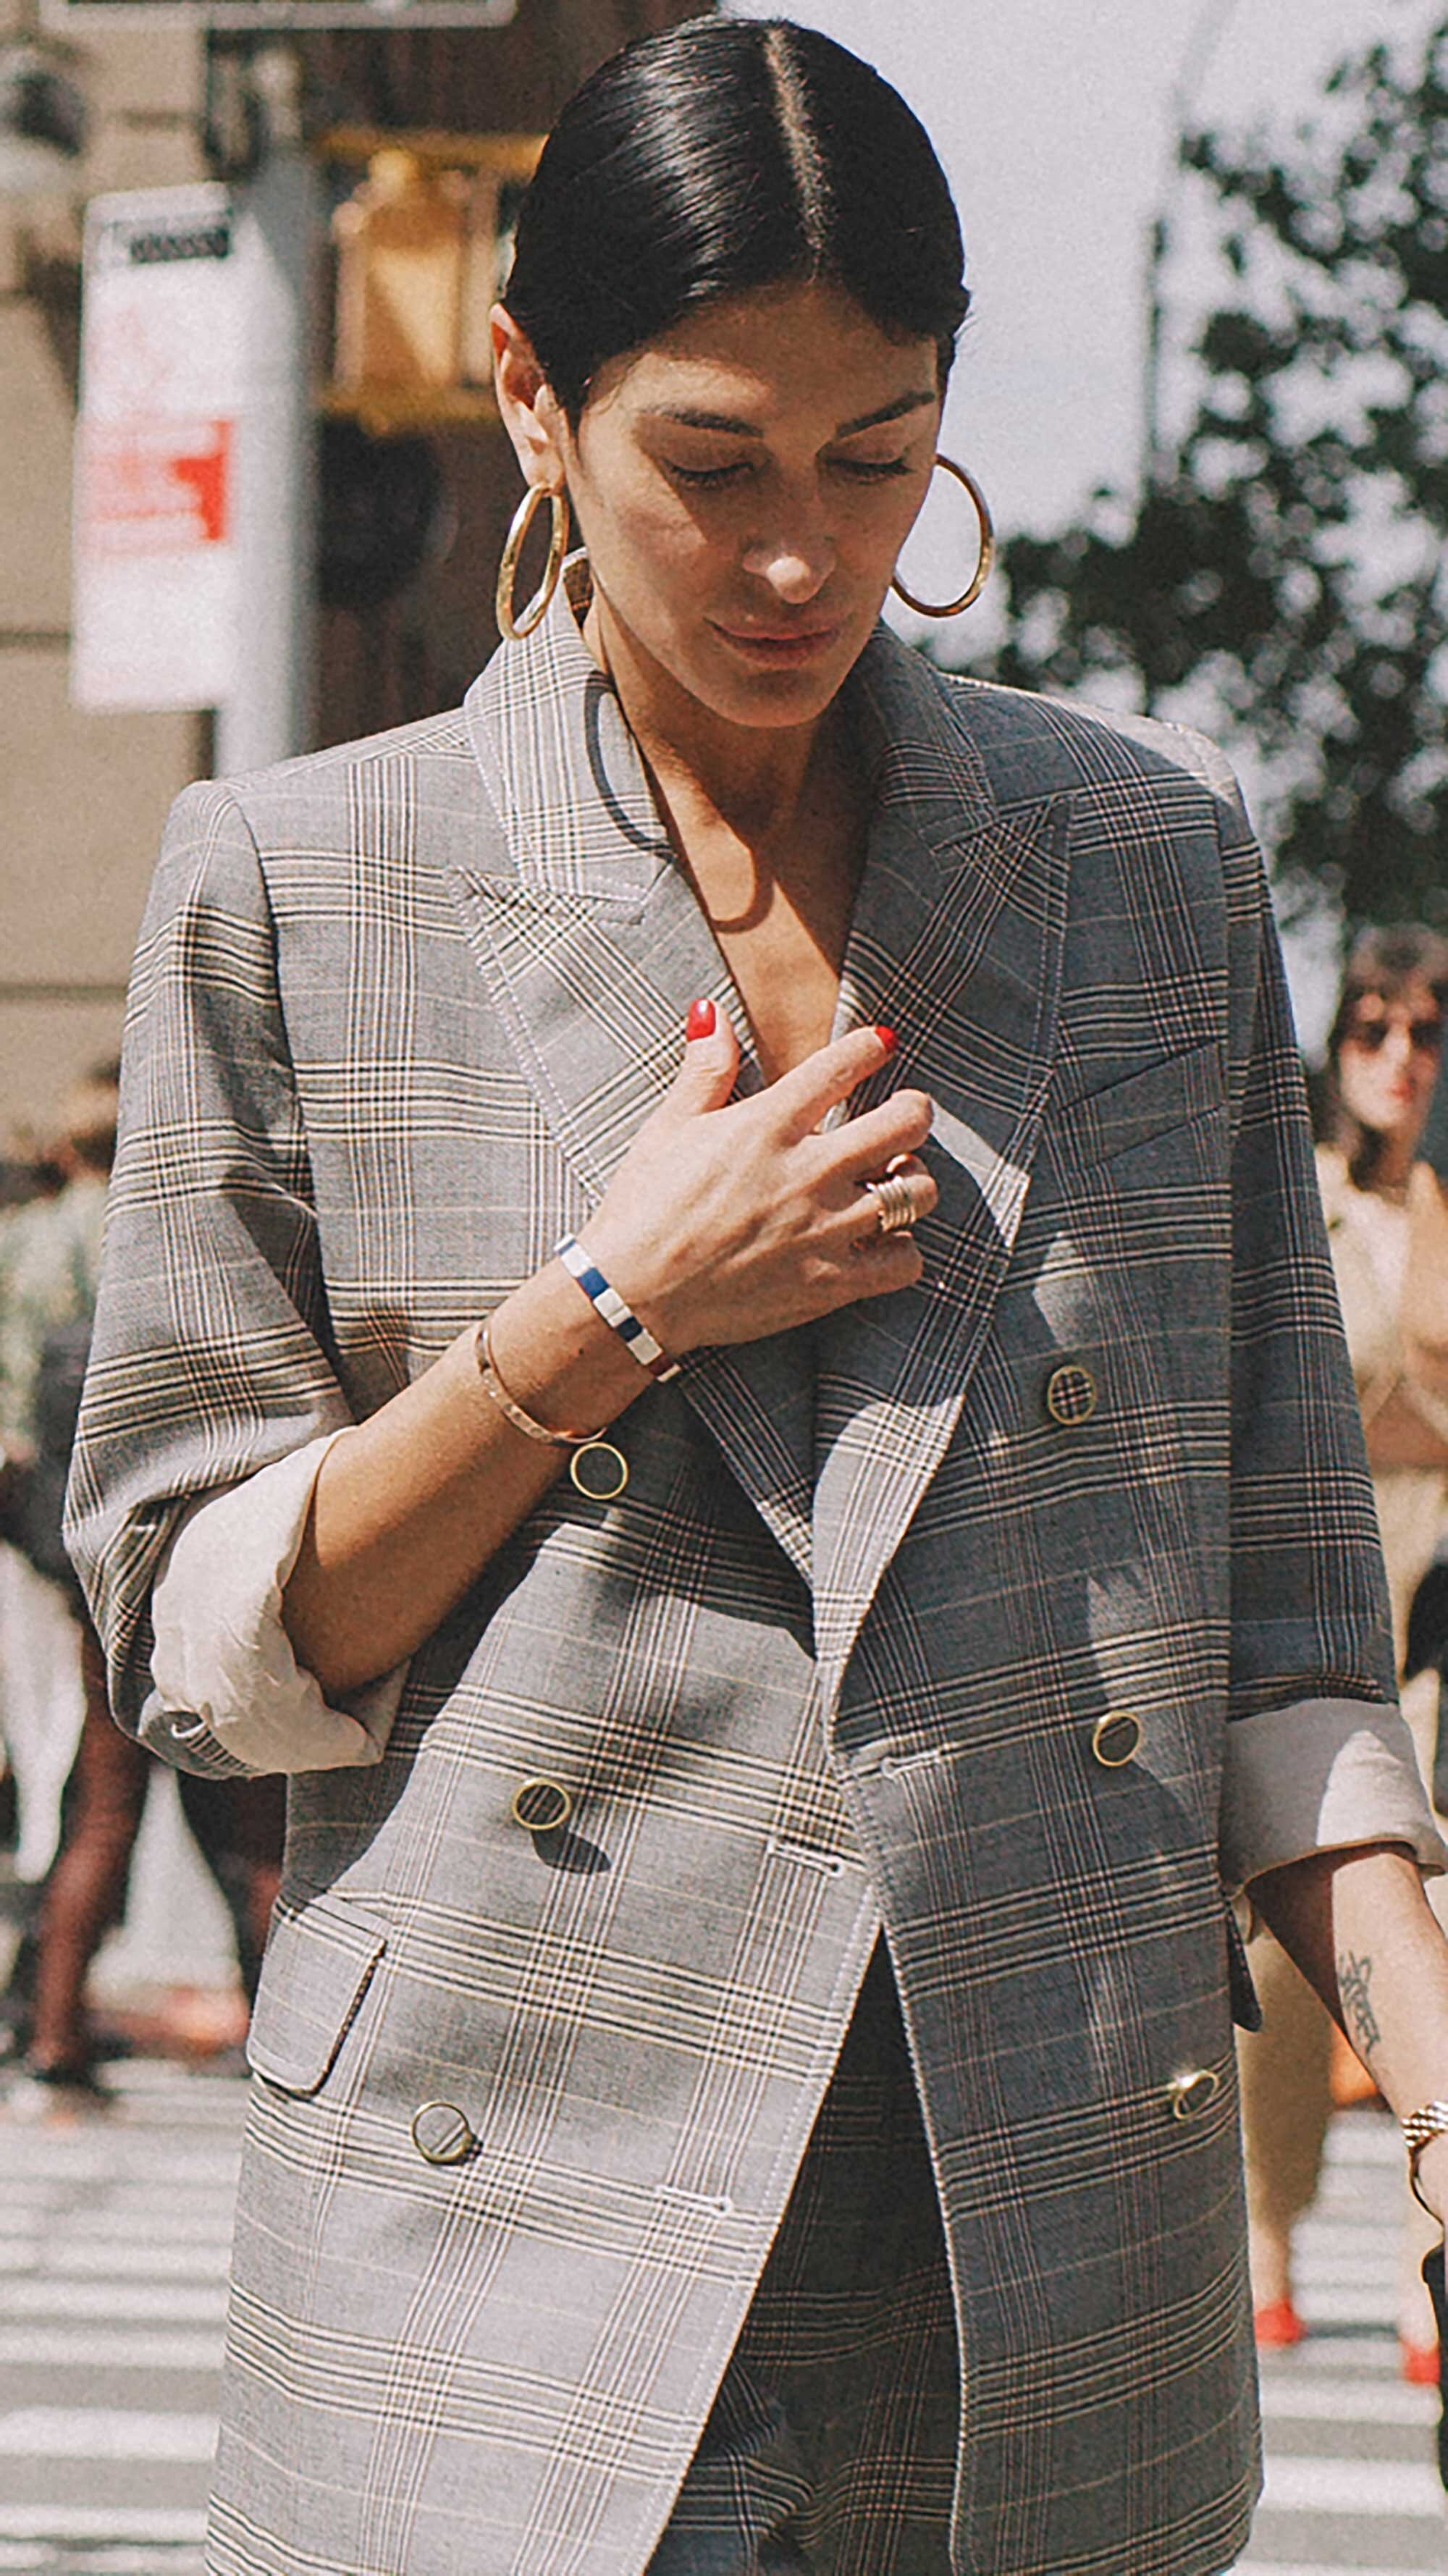 Click for more looks! Best outfits of New York Fashion Week street style 2019 Day Three Photo by @J2martinez Jose J. Martinez www.jmrtnz.com -68.jpg